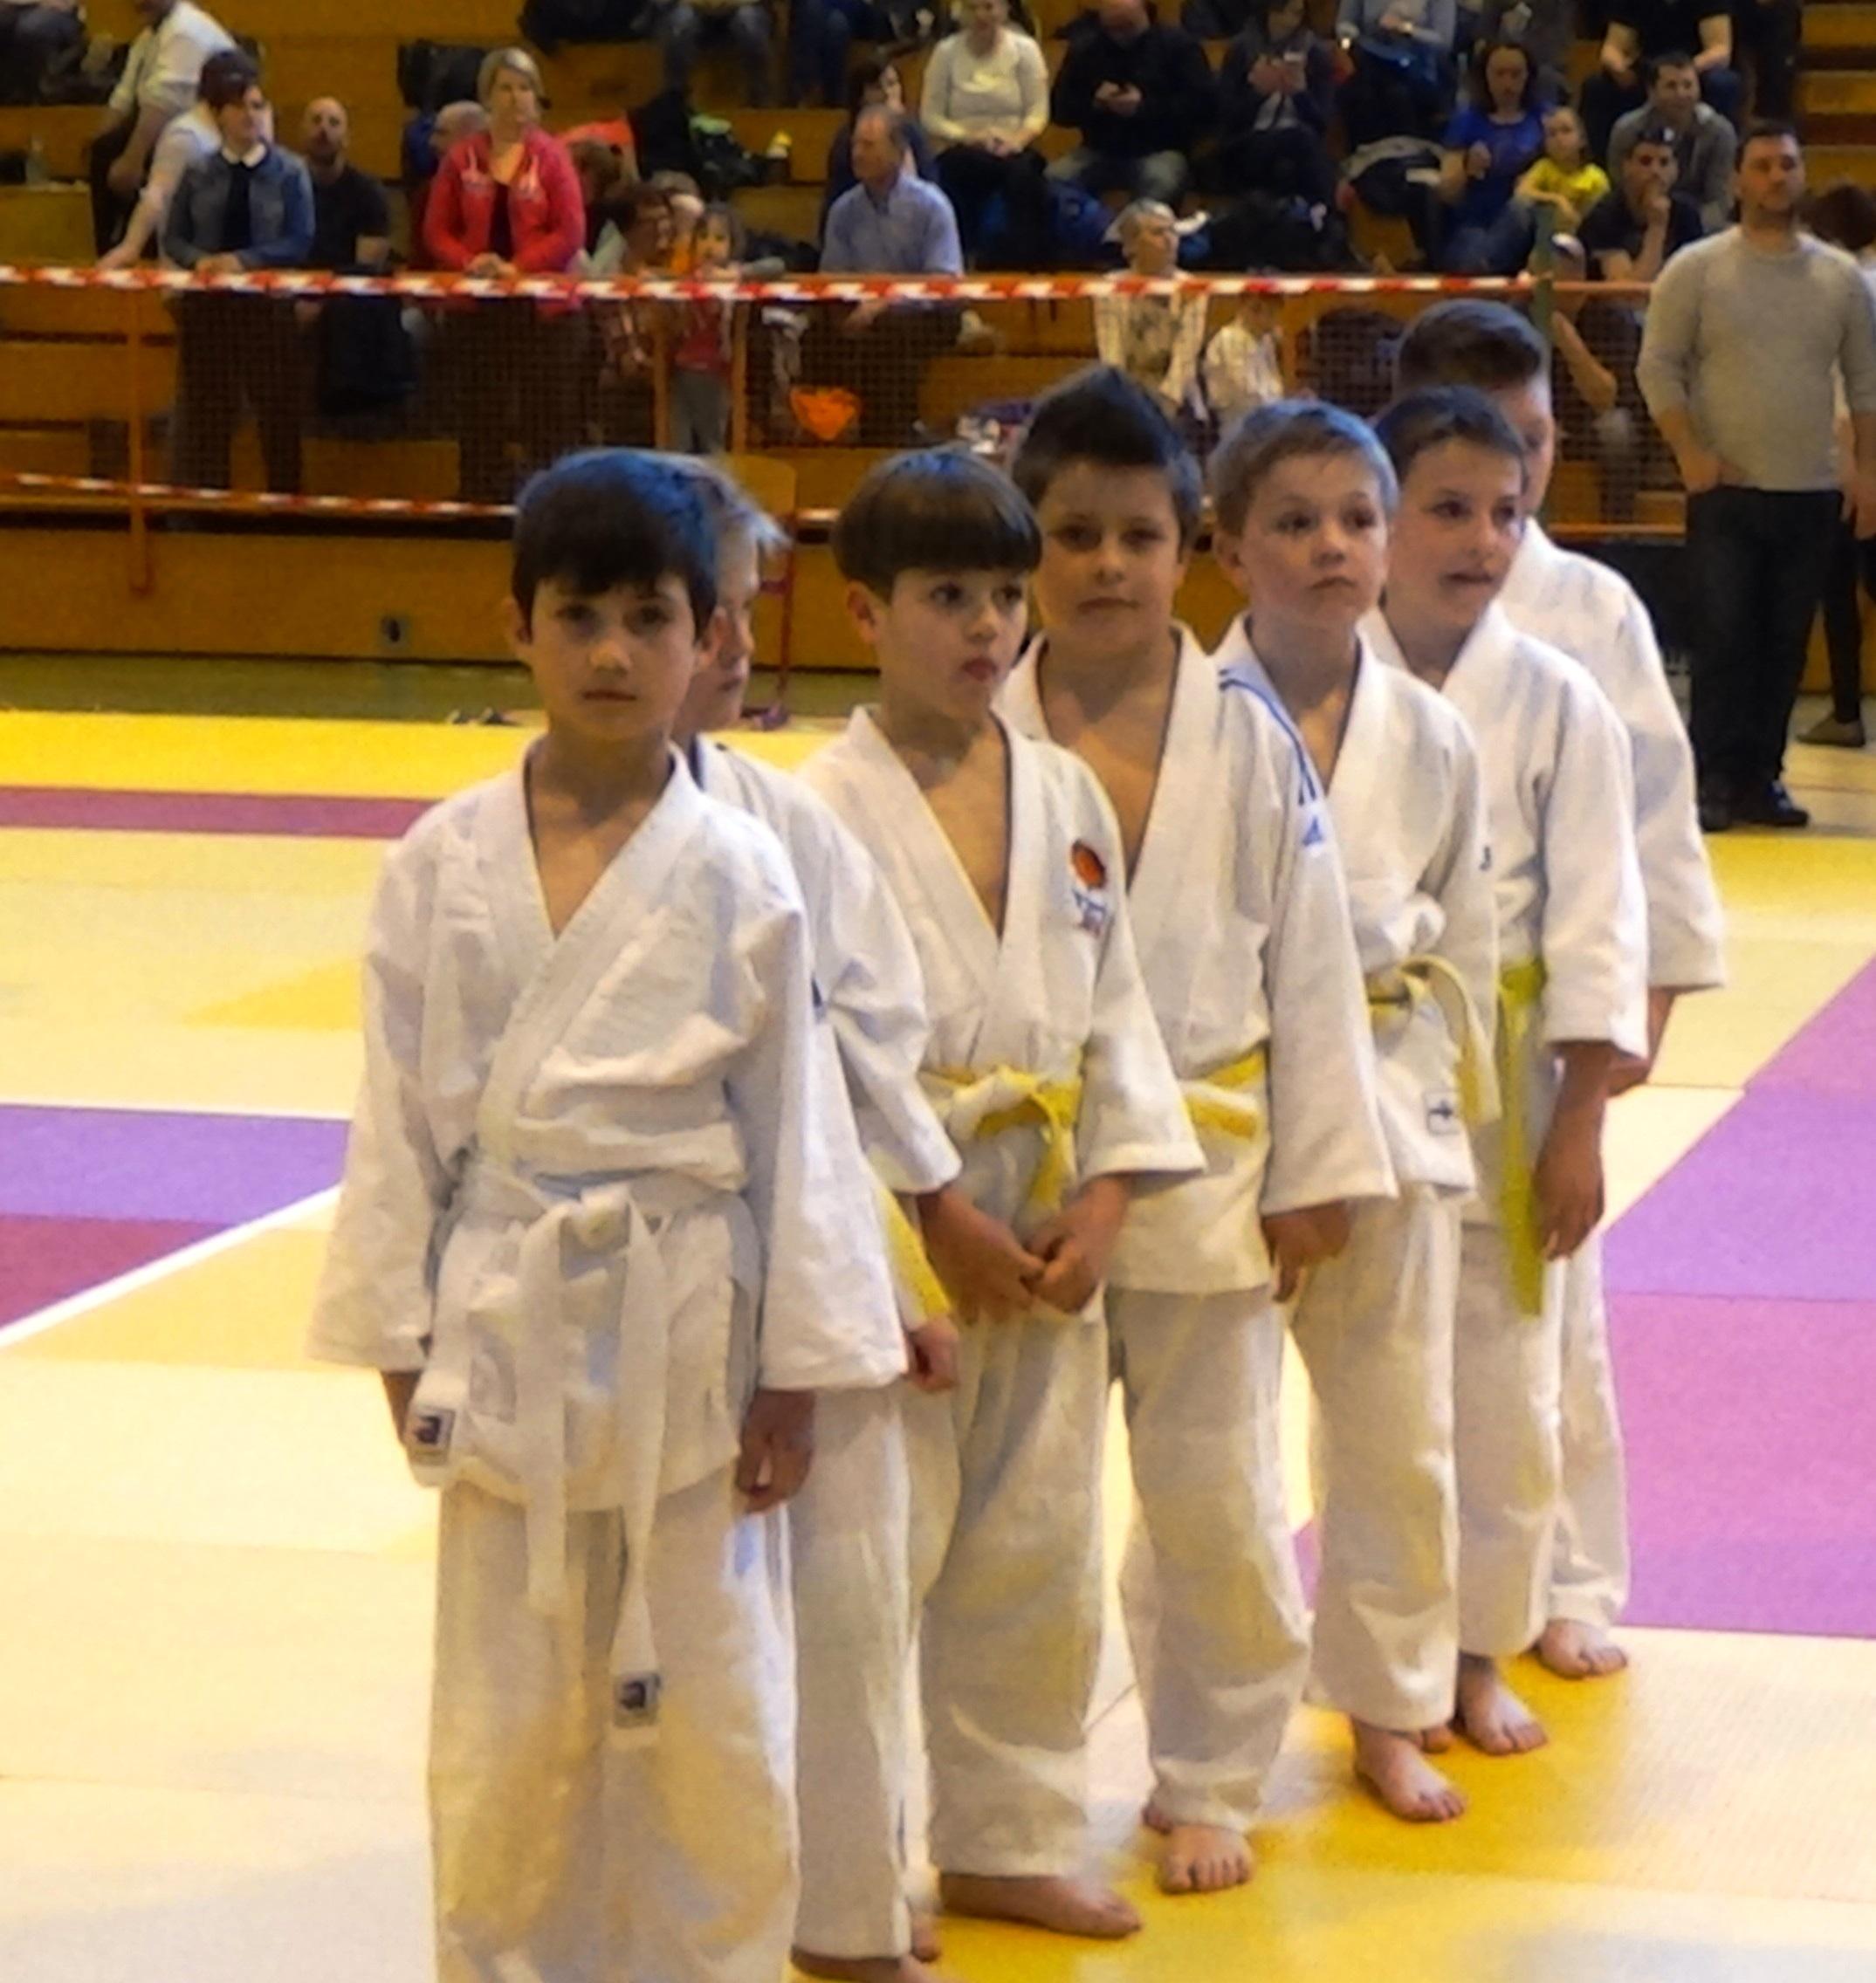 Ekipa Judo kluba Koper